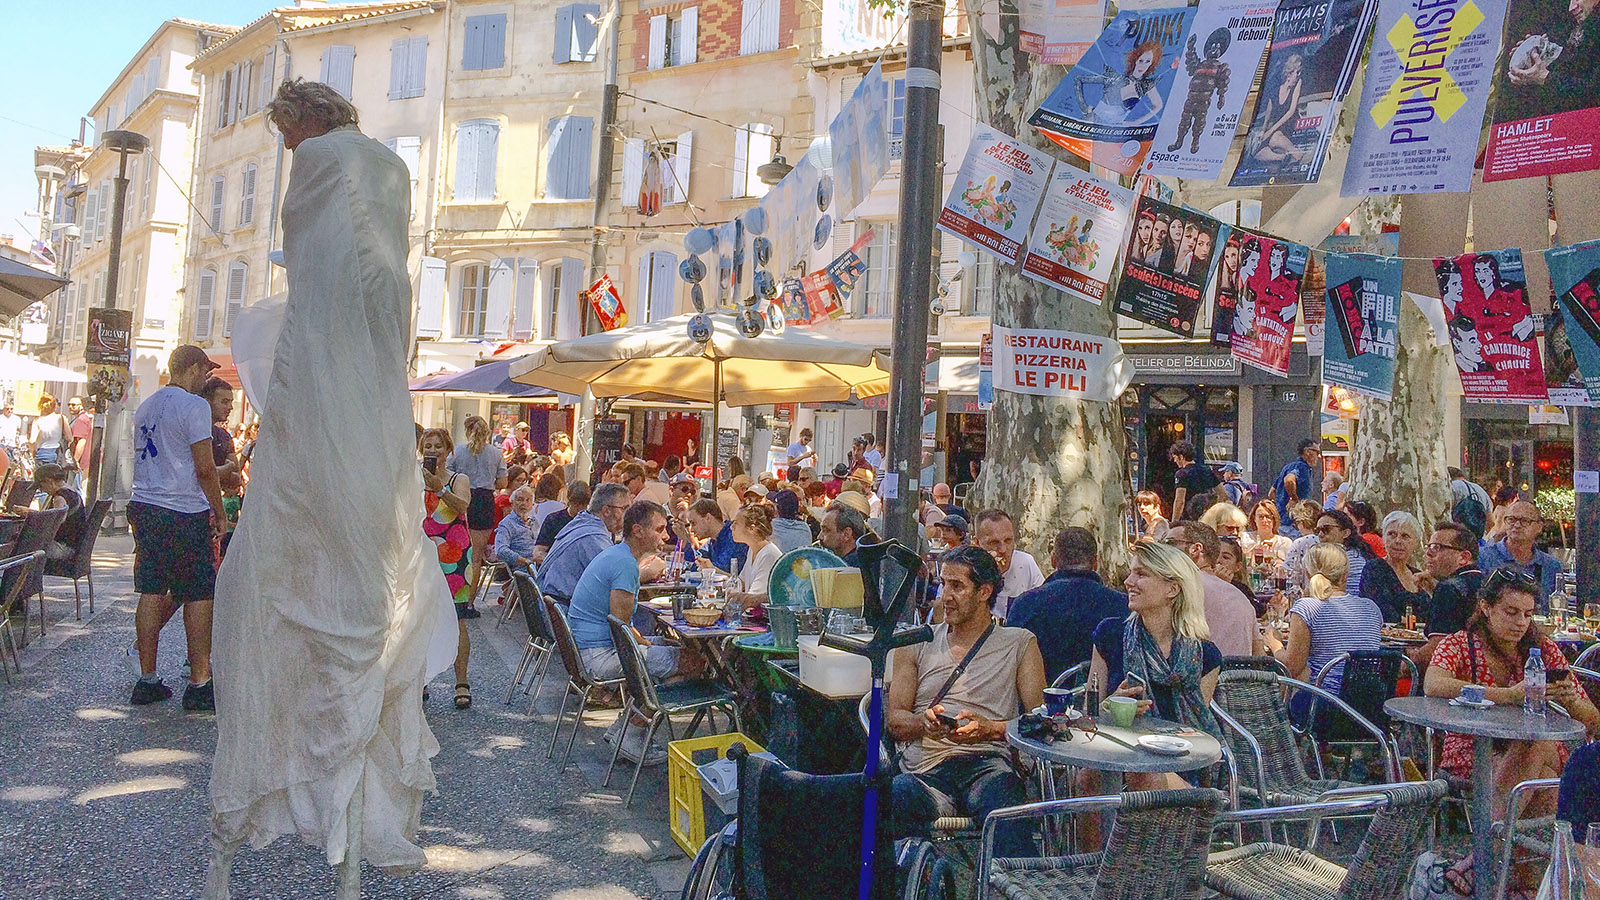 In Avignon währen des Theaterfestivals. Foto: Sarah Belhareth